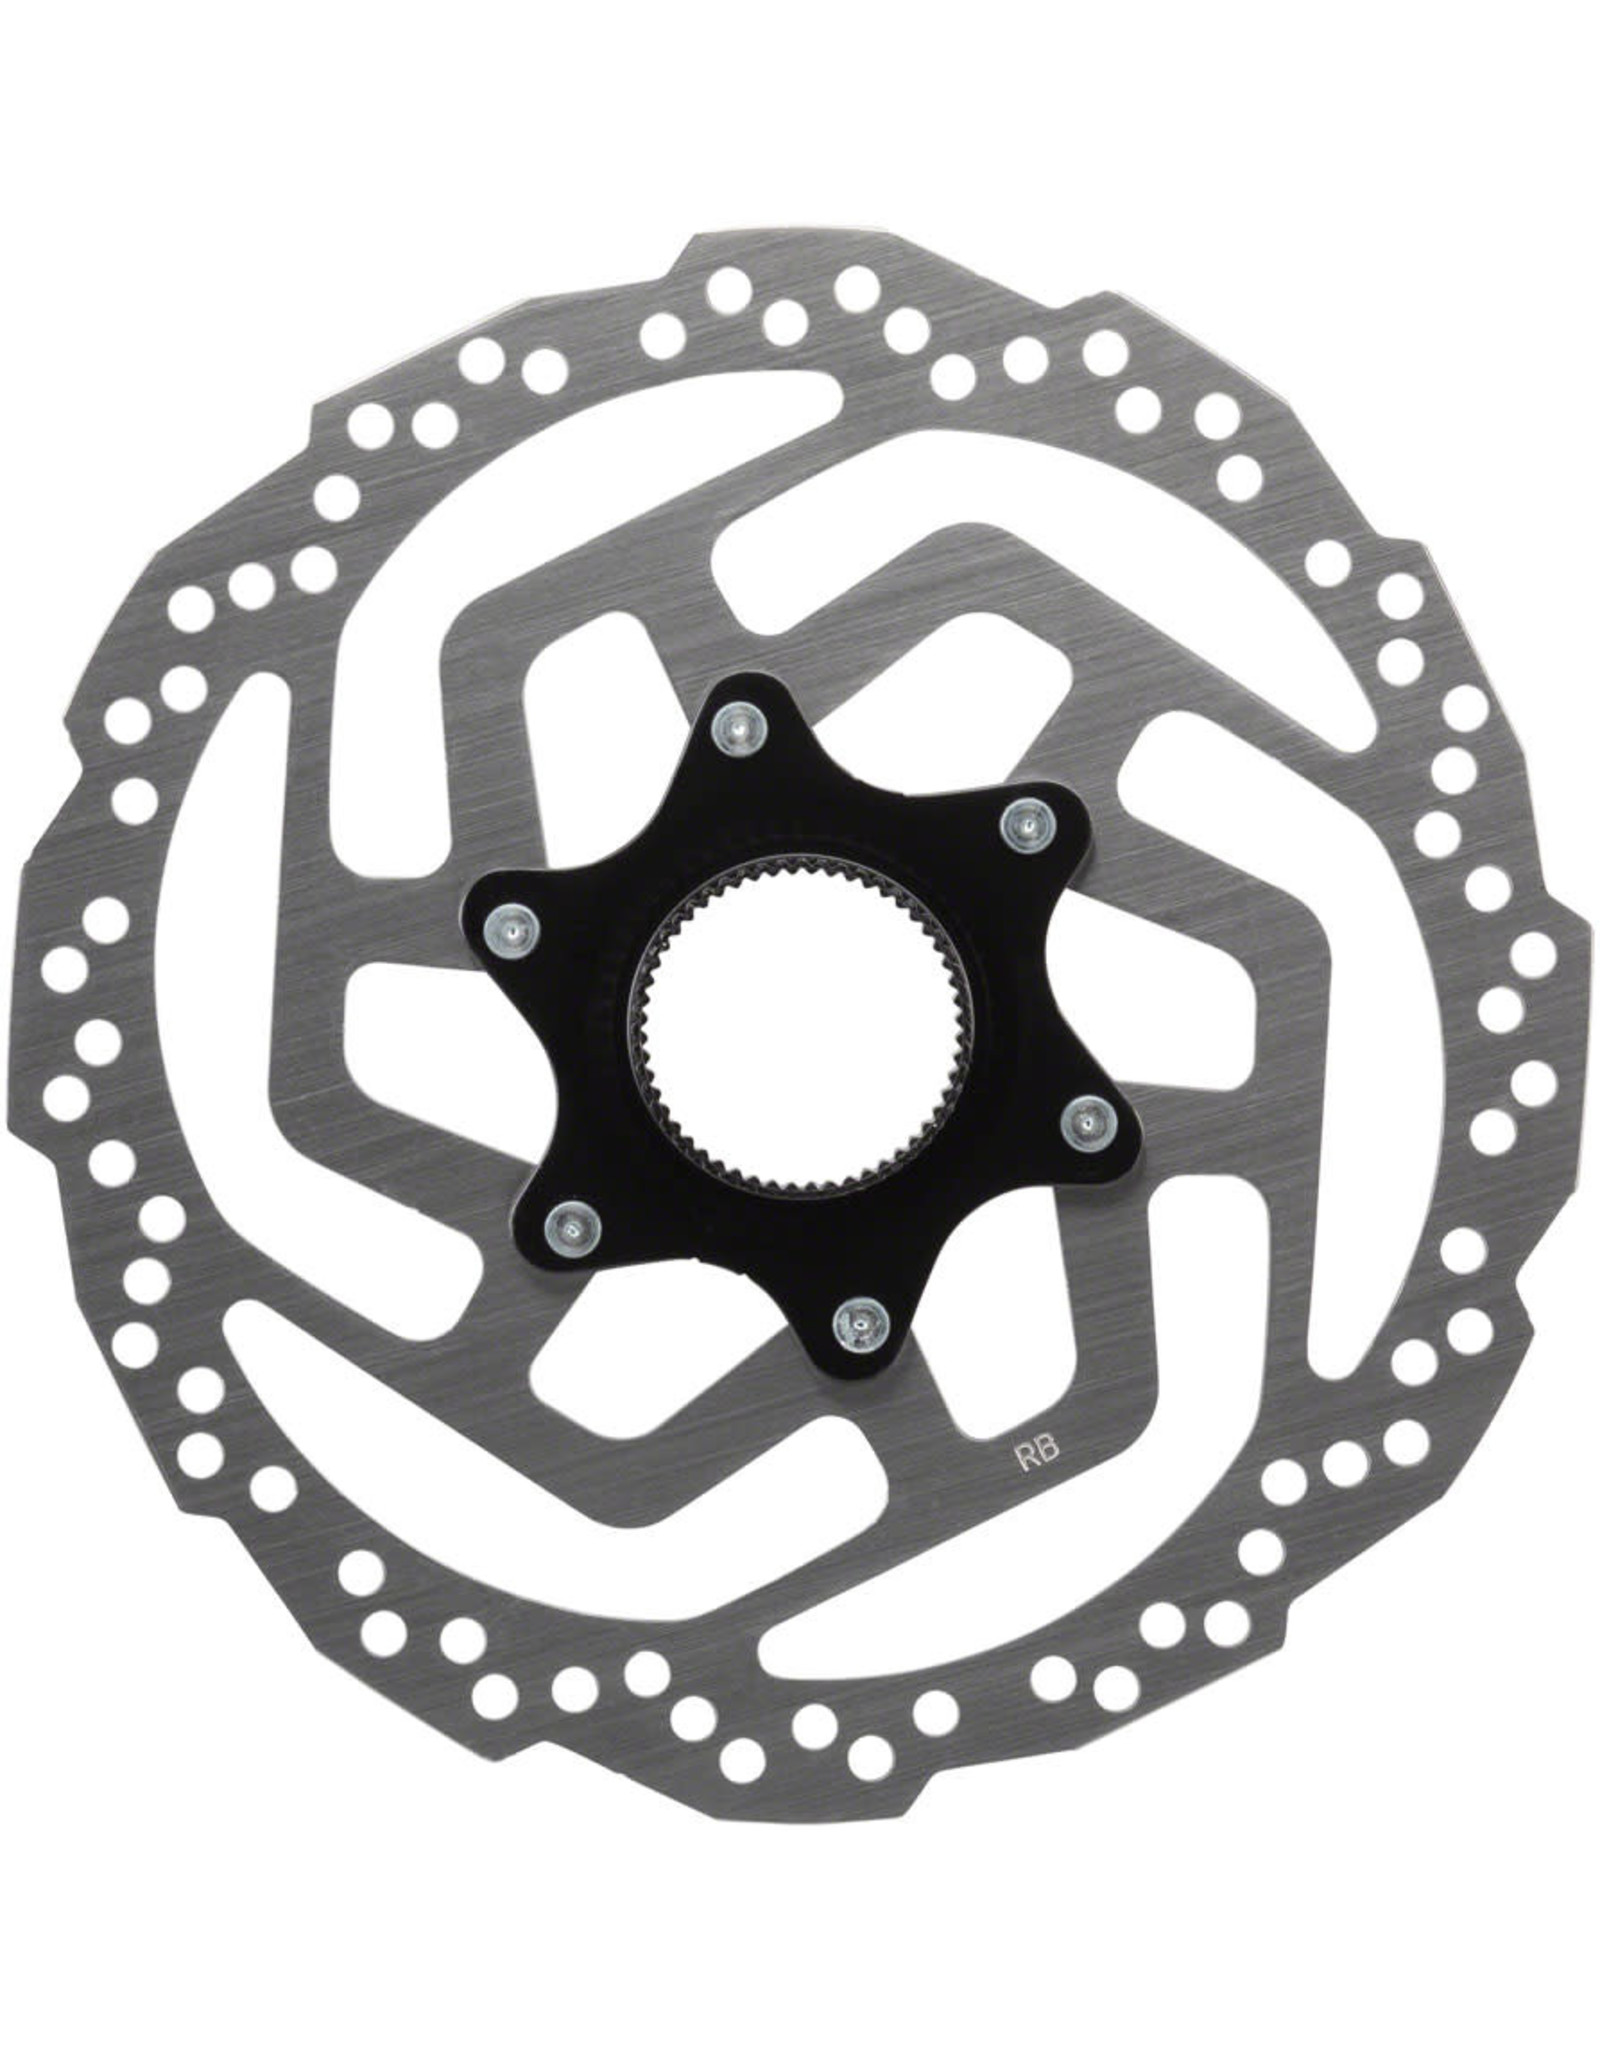 Shimano Shimano RT10M 180mm Centerlock Disc Brake Rotor, Resin Pad Only